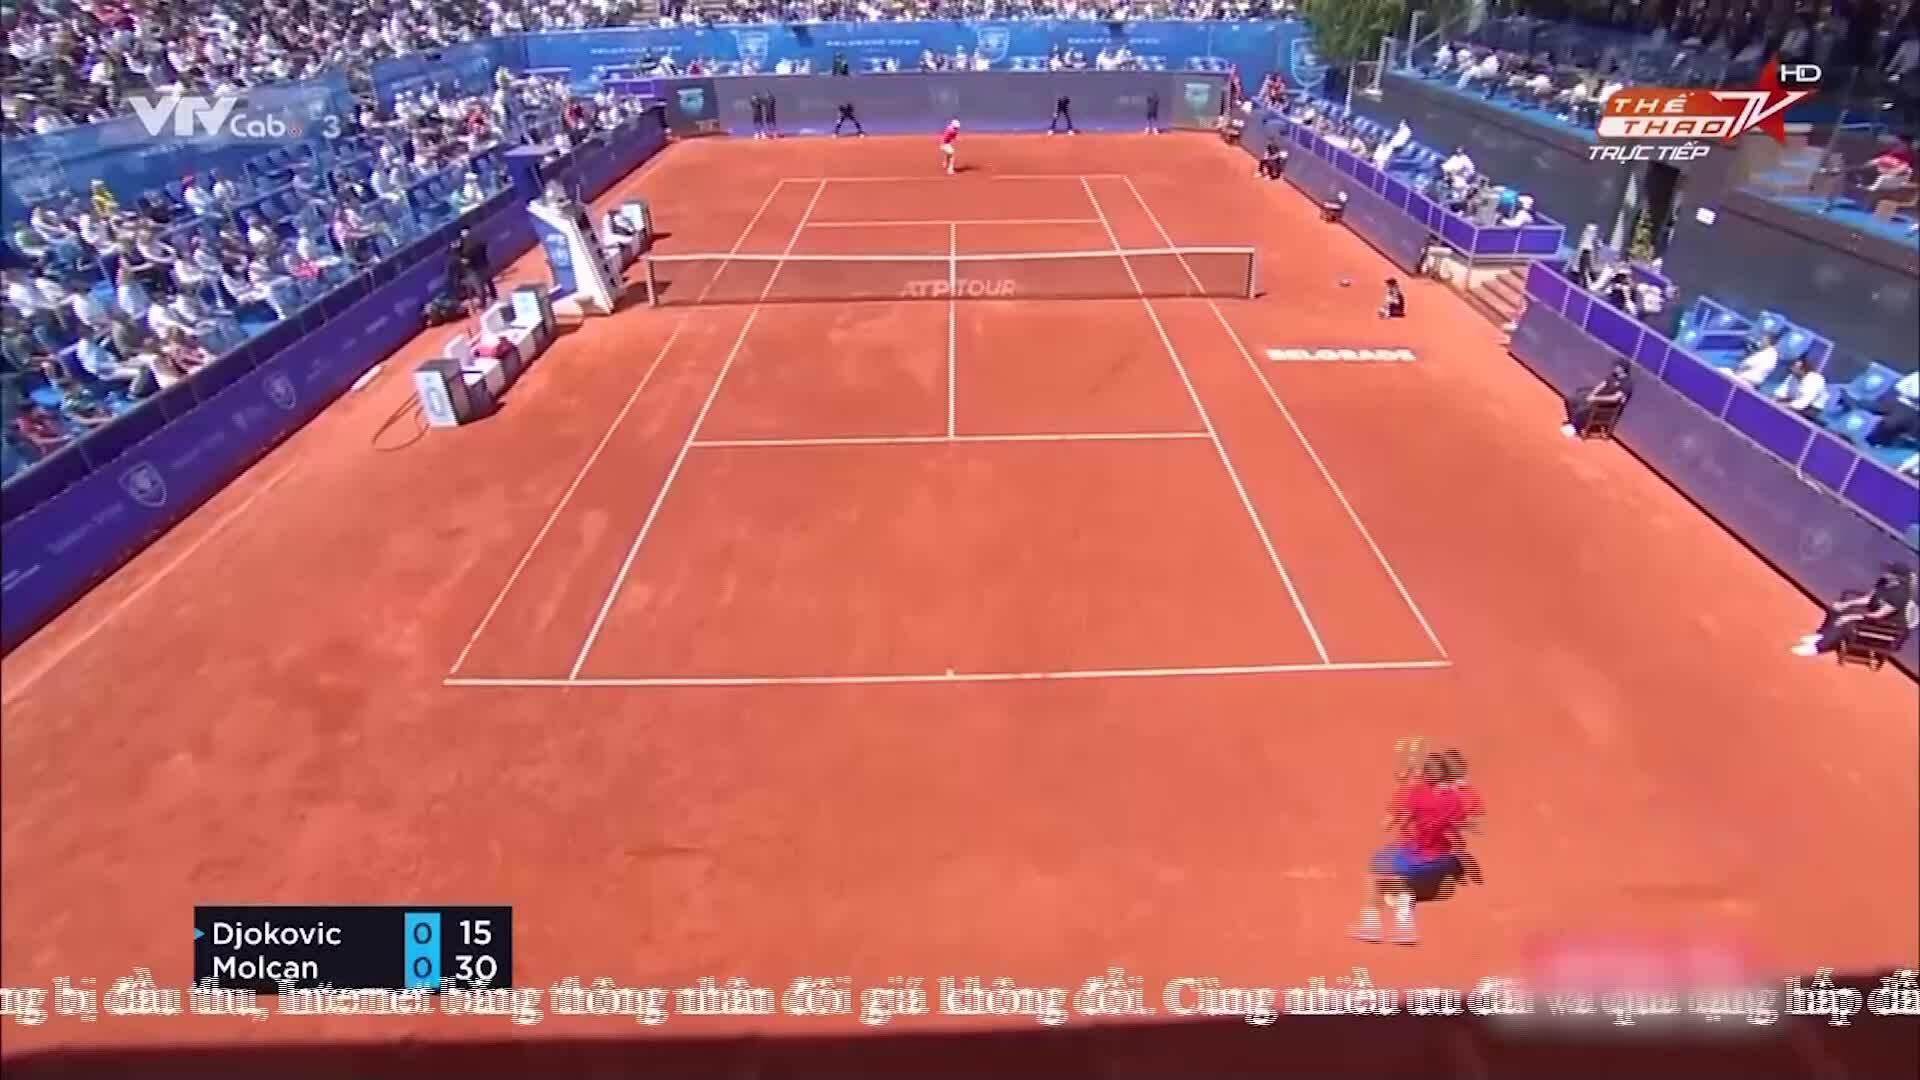 Djokovic 2-0 Molcan